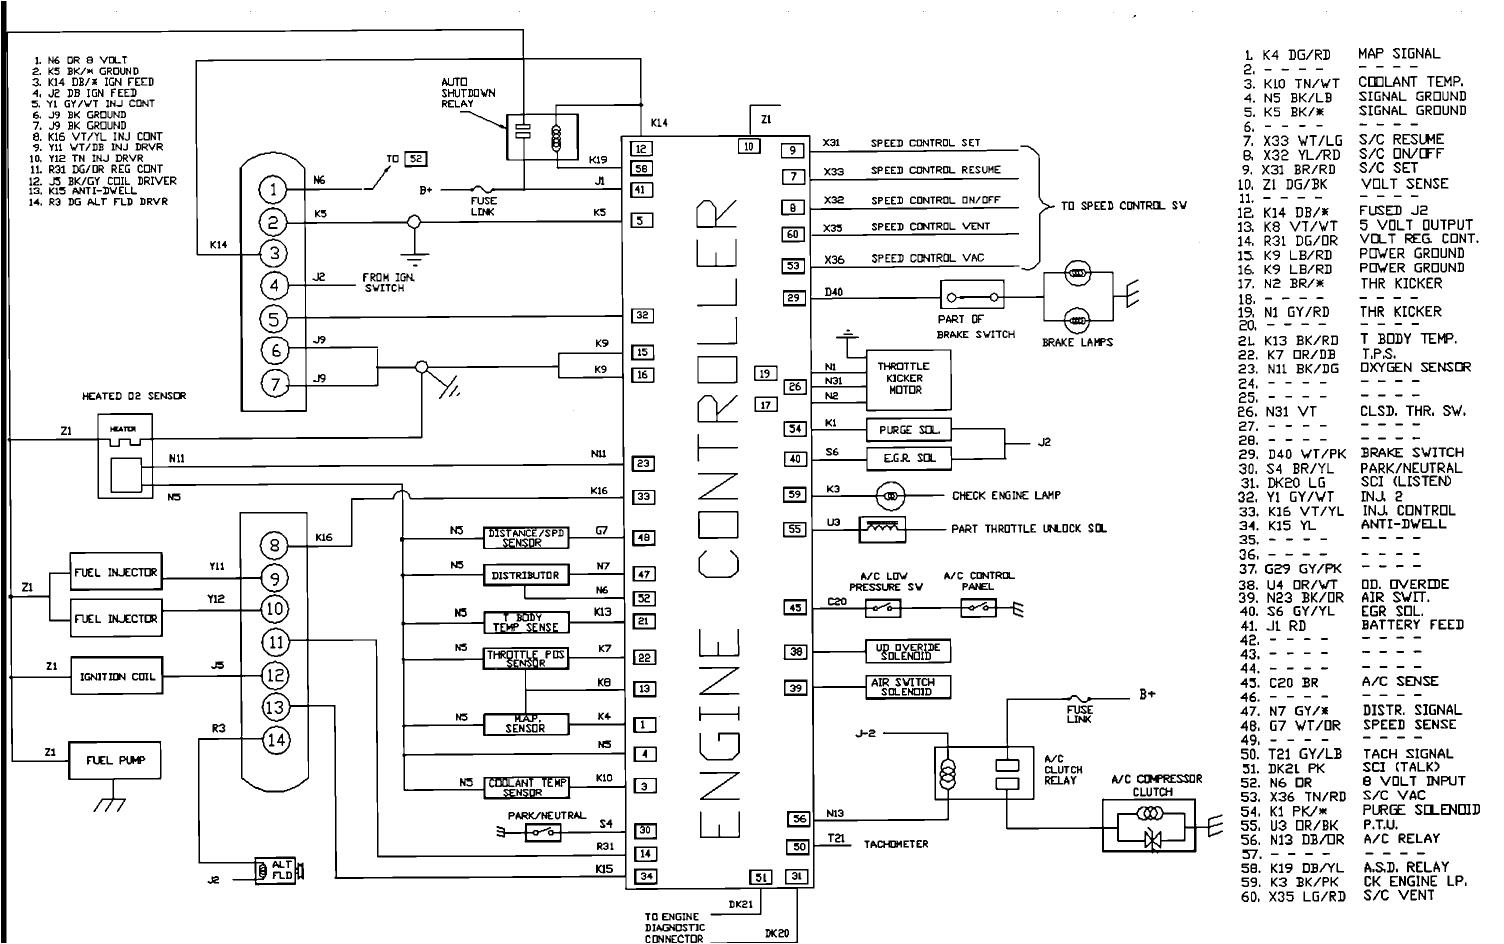 2003 dodge ram 2500 wiring diagram